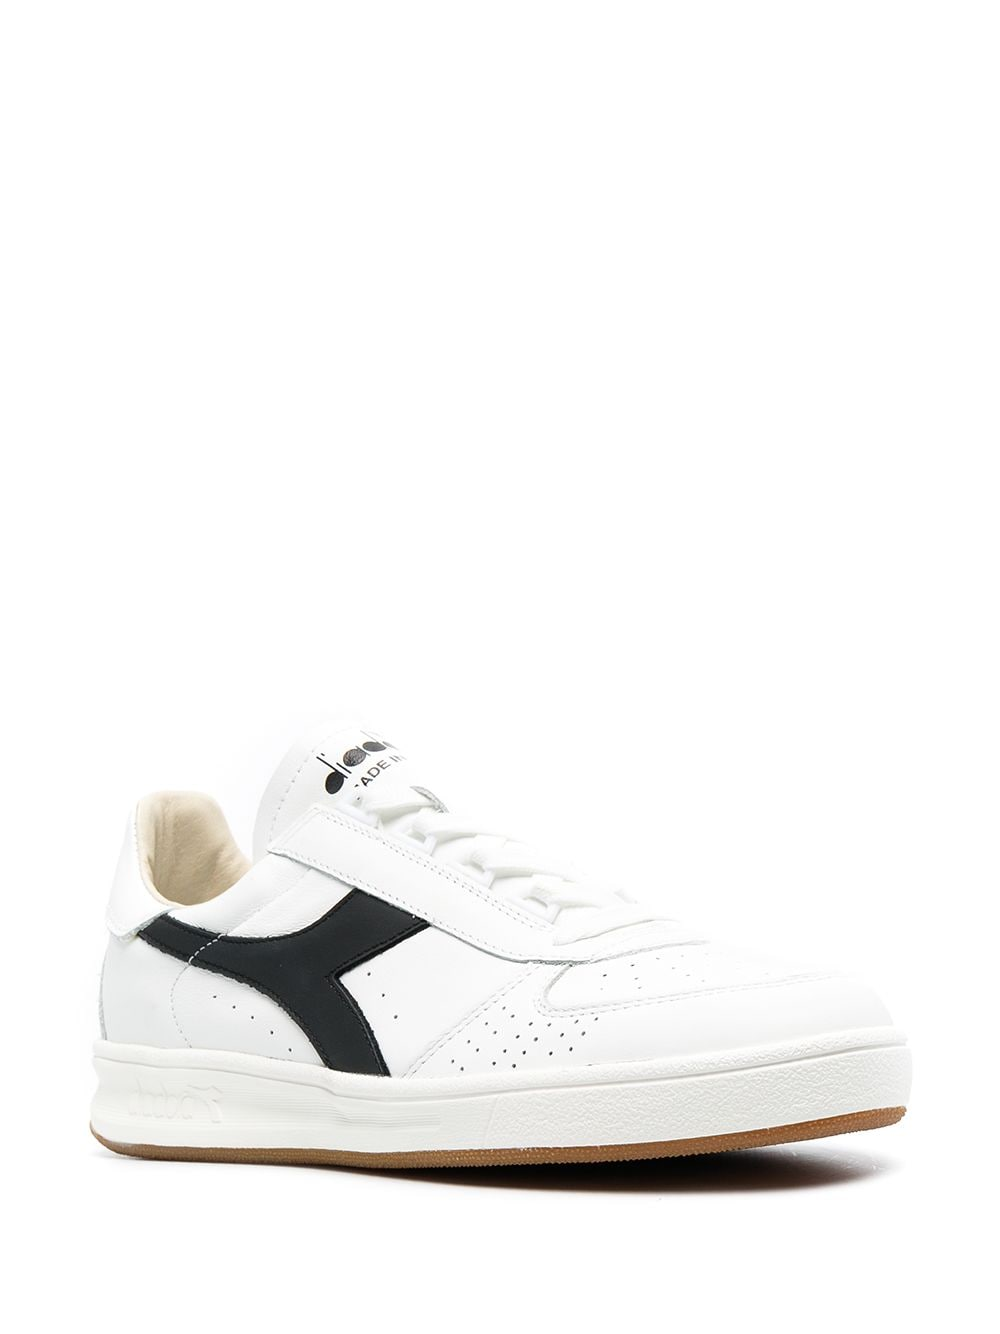 Diadora b elite h sneakers man DIADORA   Sneakers   201.176277C0351